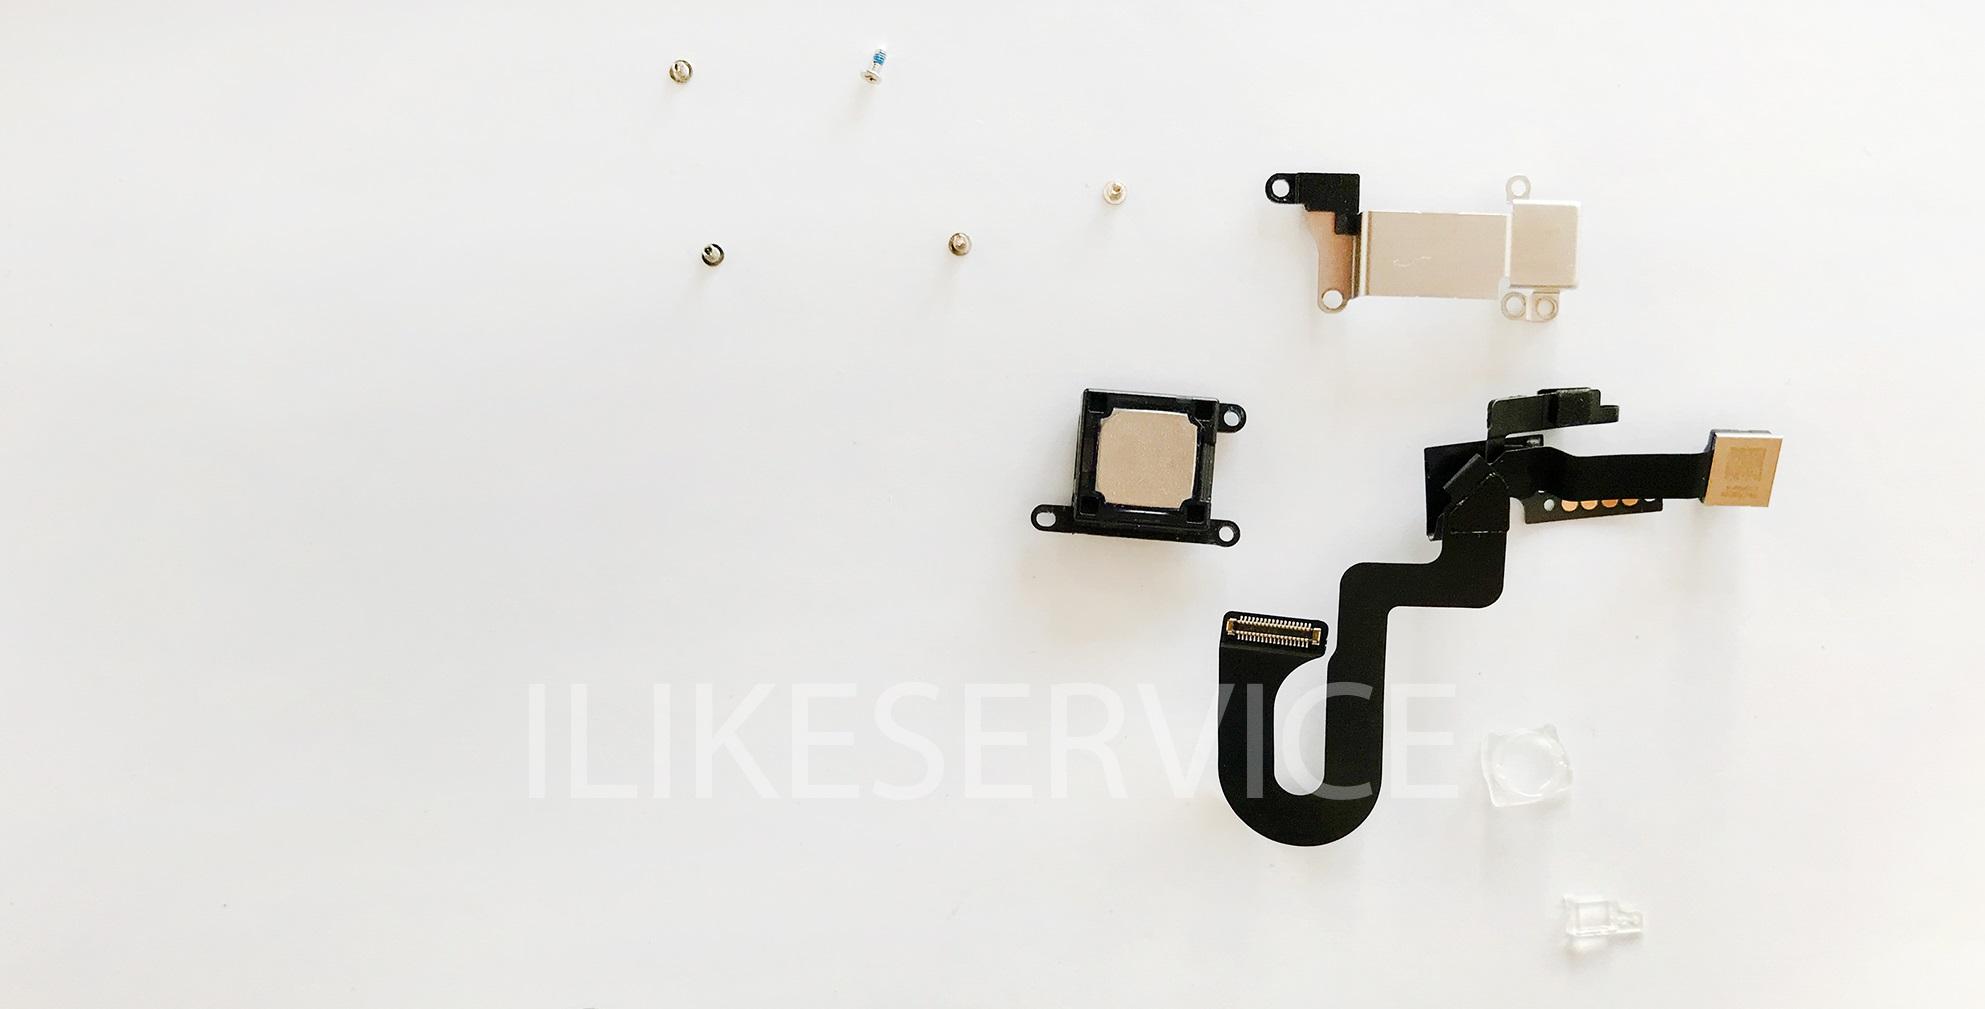 Замена шлейфа фронтальной камеры iPhone